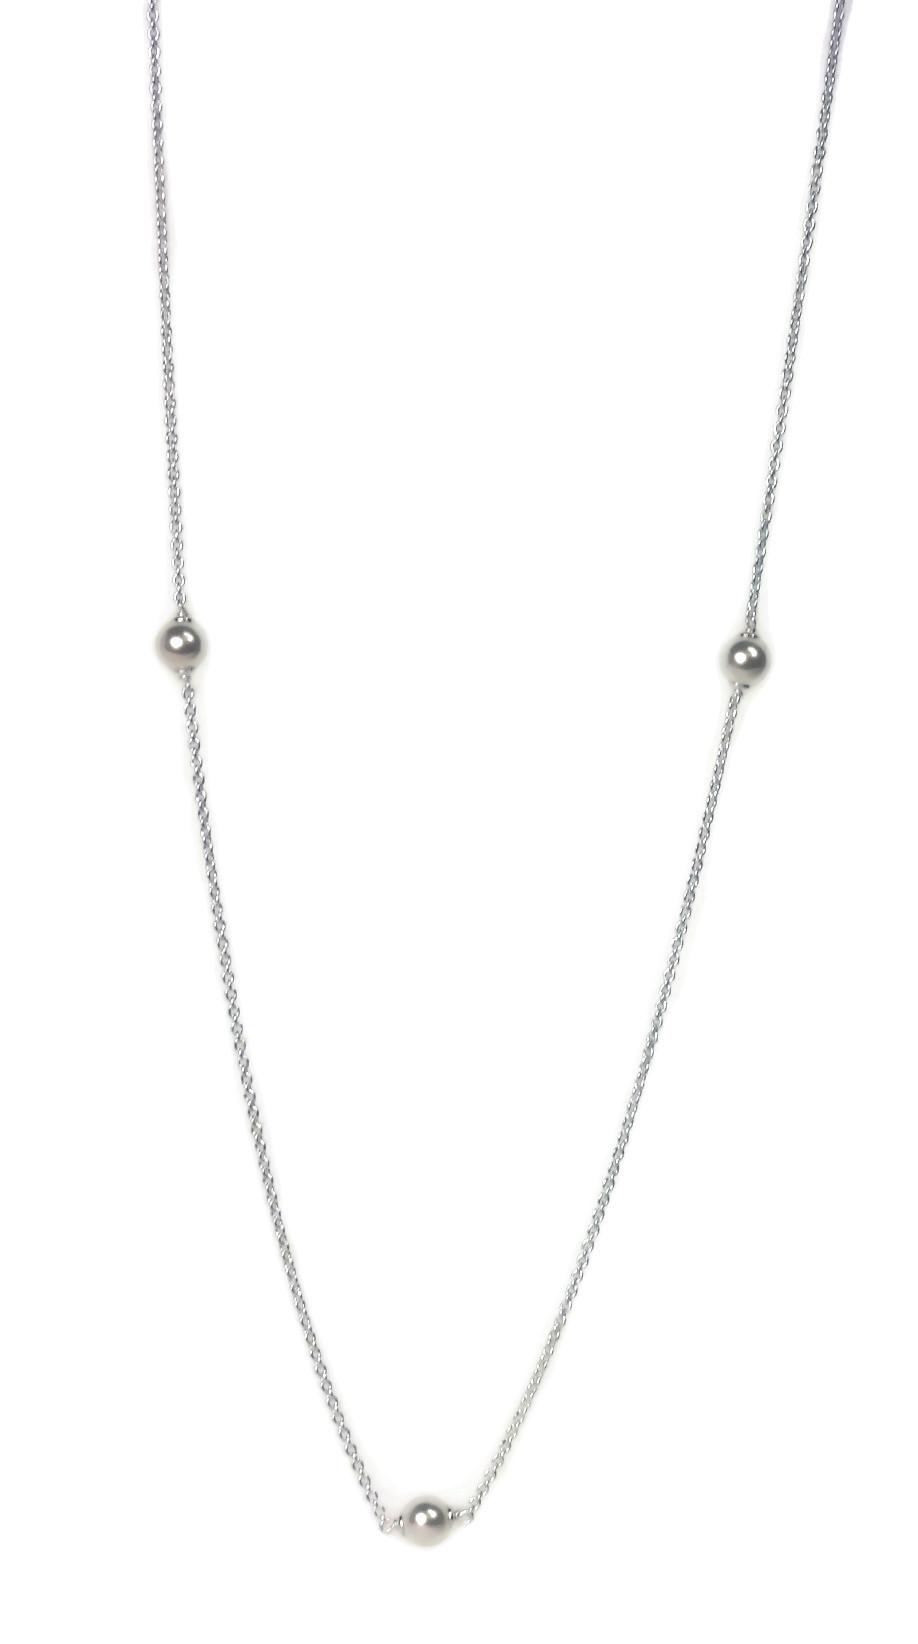 66d1de21f PANDORA Luminous Dainty Droplets, White Crystal Pearl 590539WCP-80. Droplets  of white crystal pearls cascade down an 80 cm chain on this gracefully edgy  ...